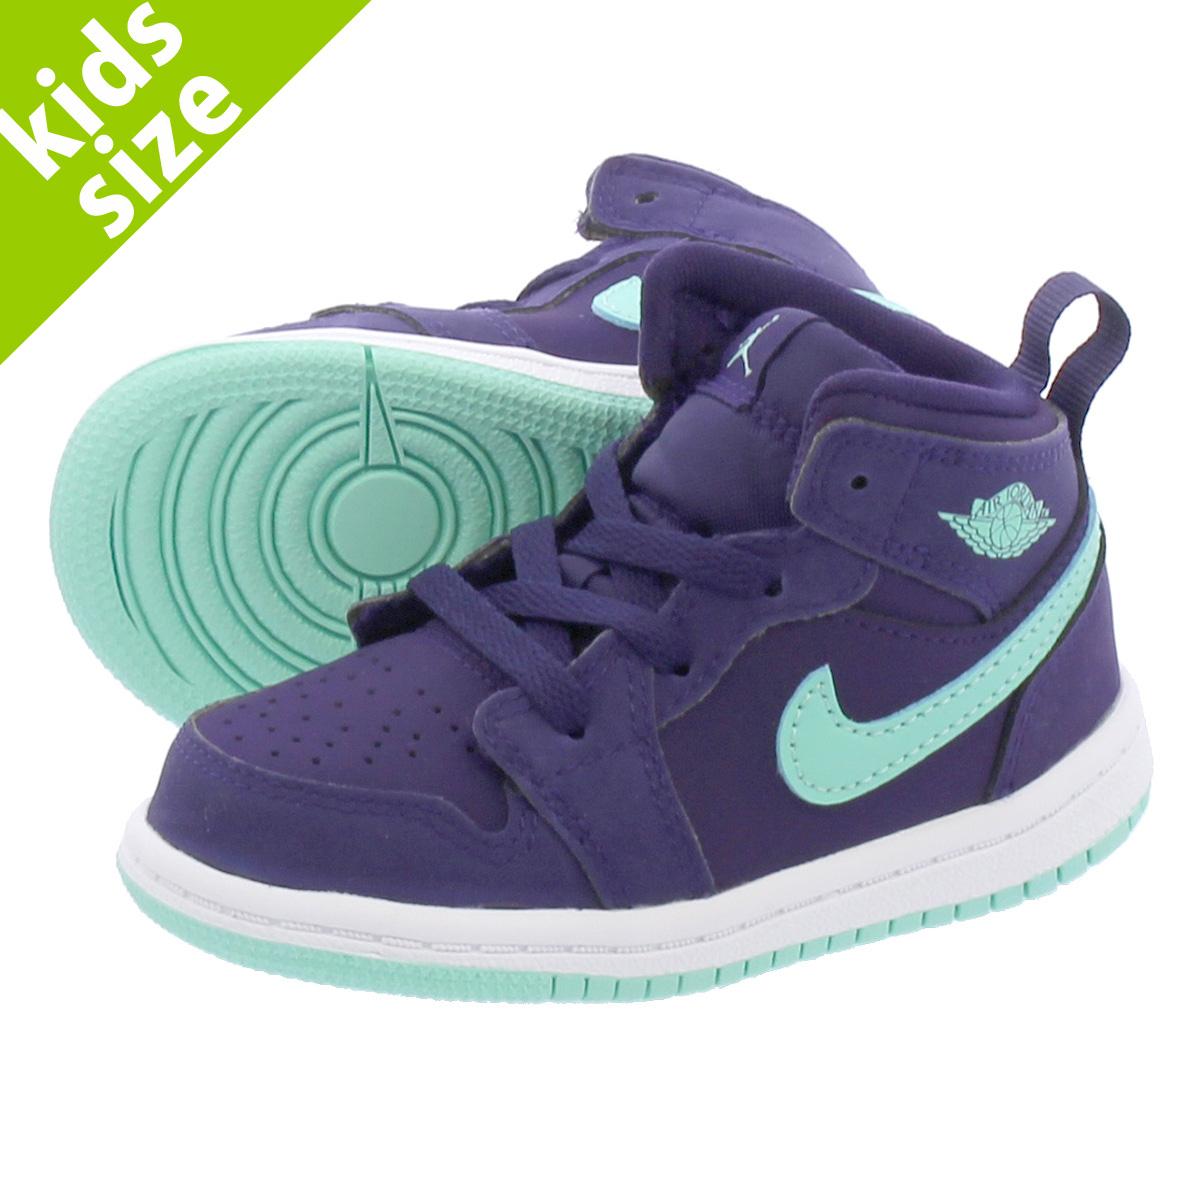 meet 19b2f 76412 NIKE AIR JORDAN 1 MID GT Nike Air Jordan 1 mid GT PURPLE EMERALD RISE WHITE  644,507-501